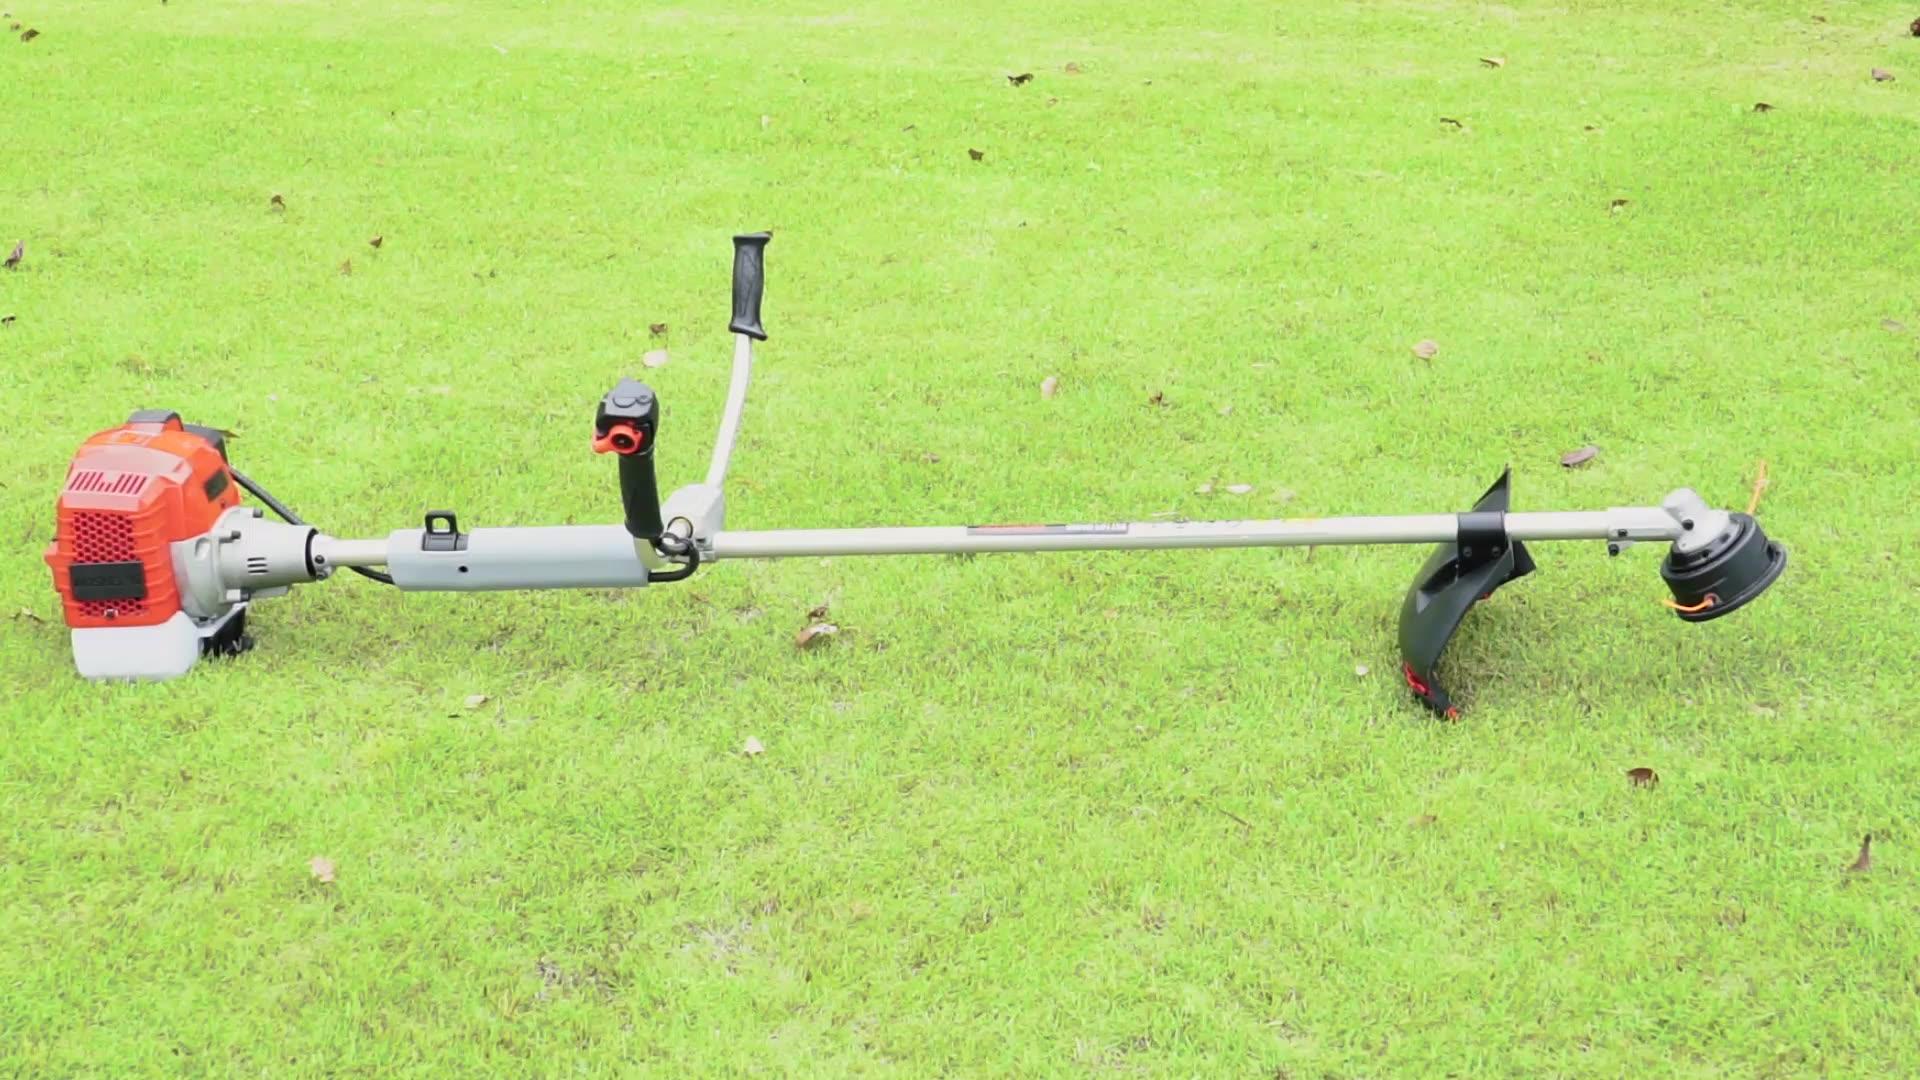 AOSHENG a benzina ad alte prestazioni lama decespugliatore 52cc decespugliatore a benzina erba trimmer